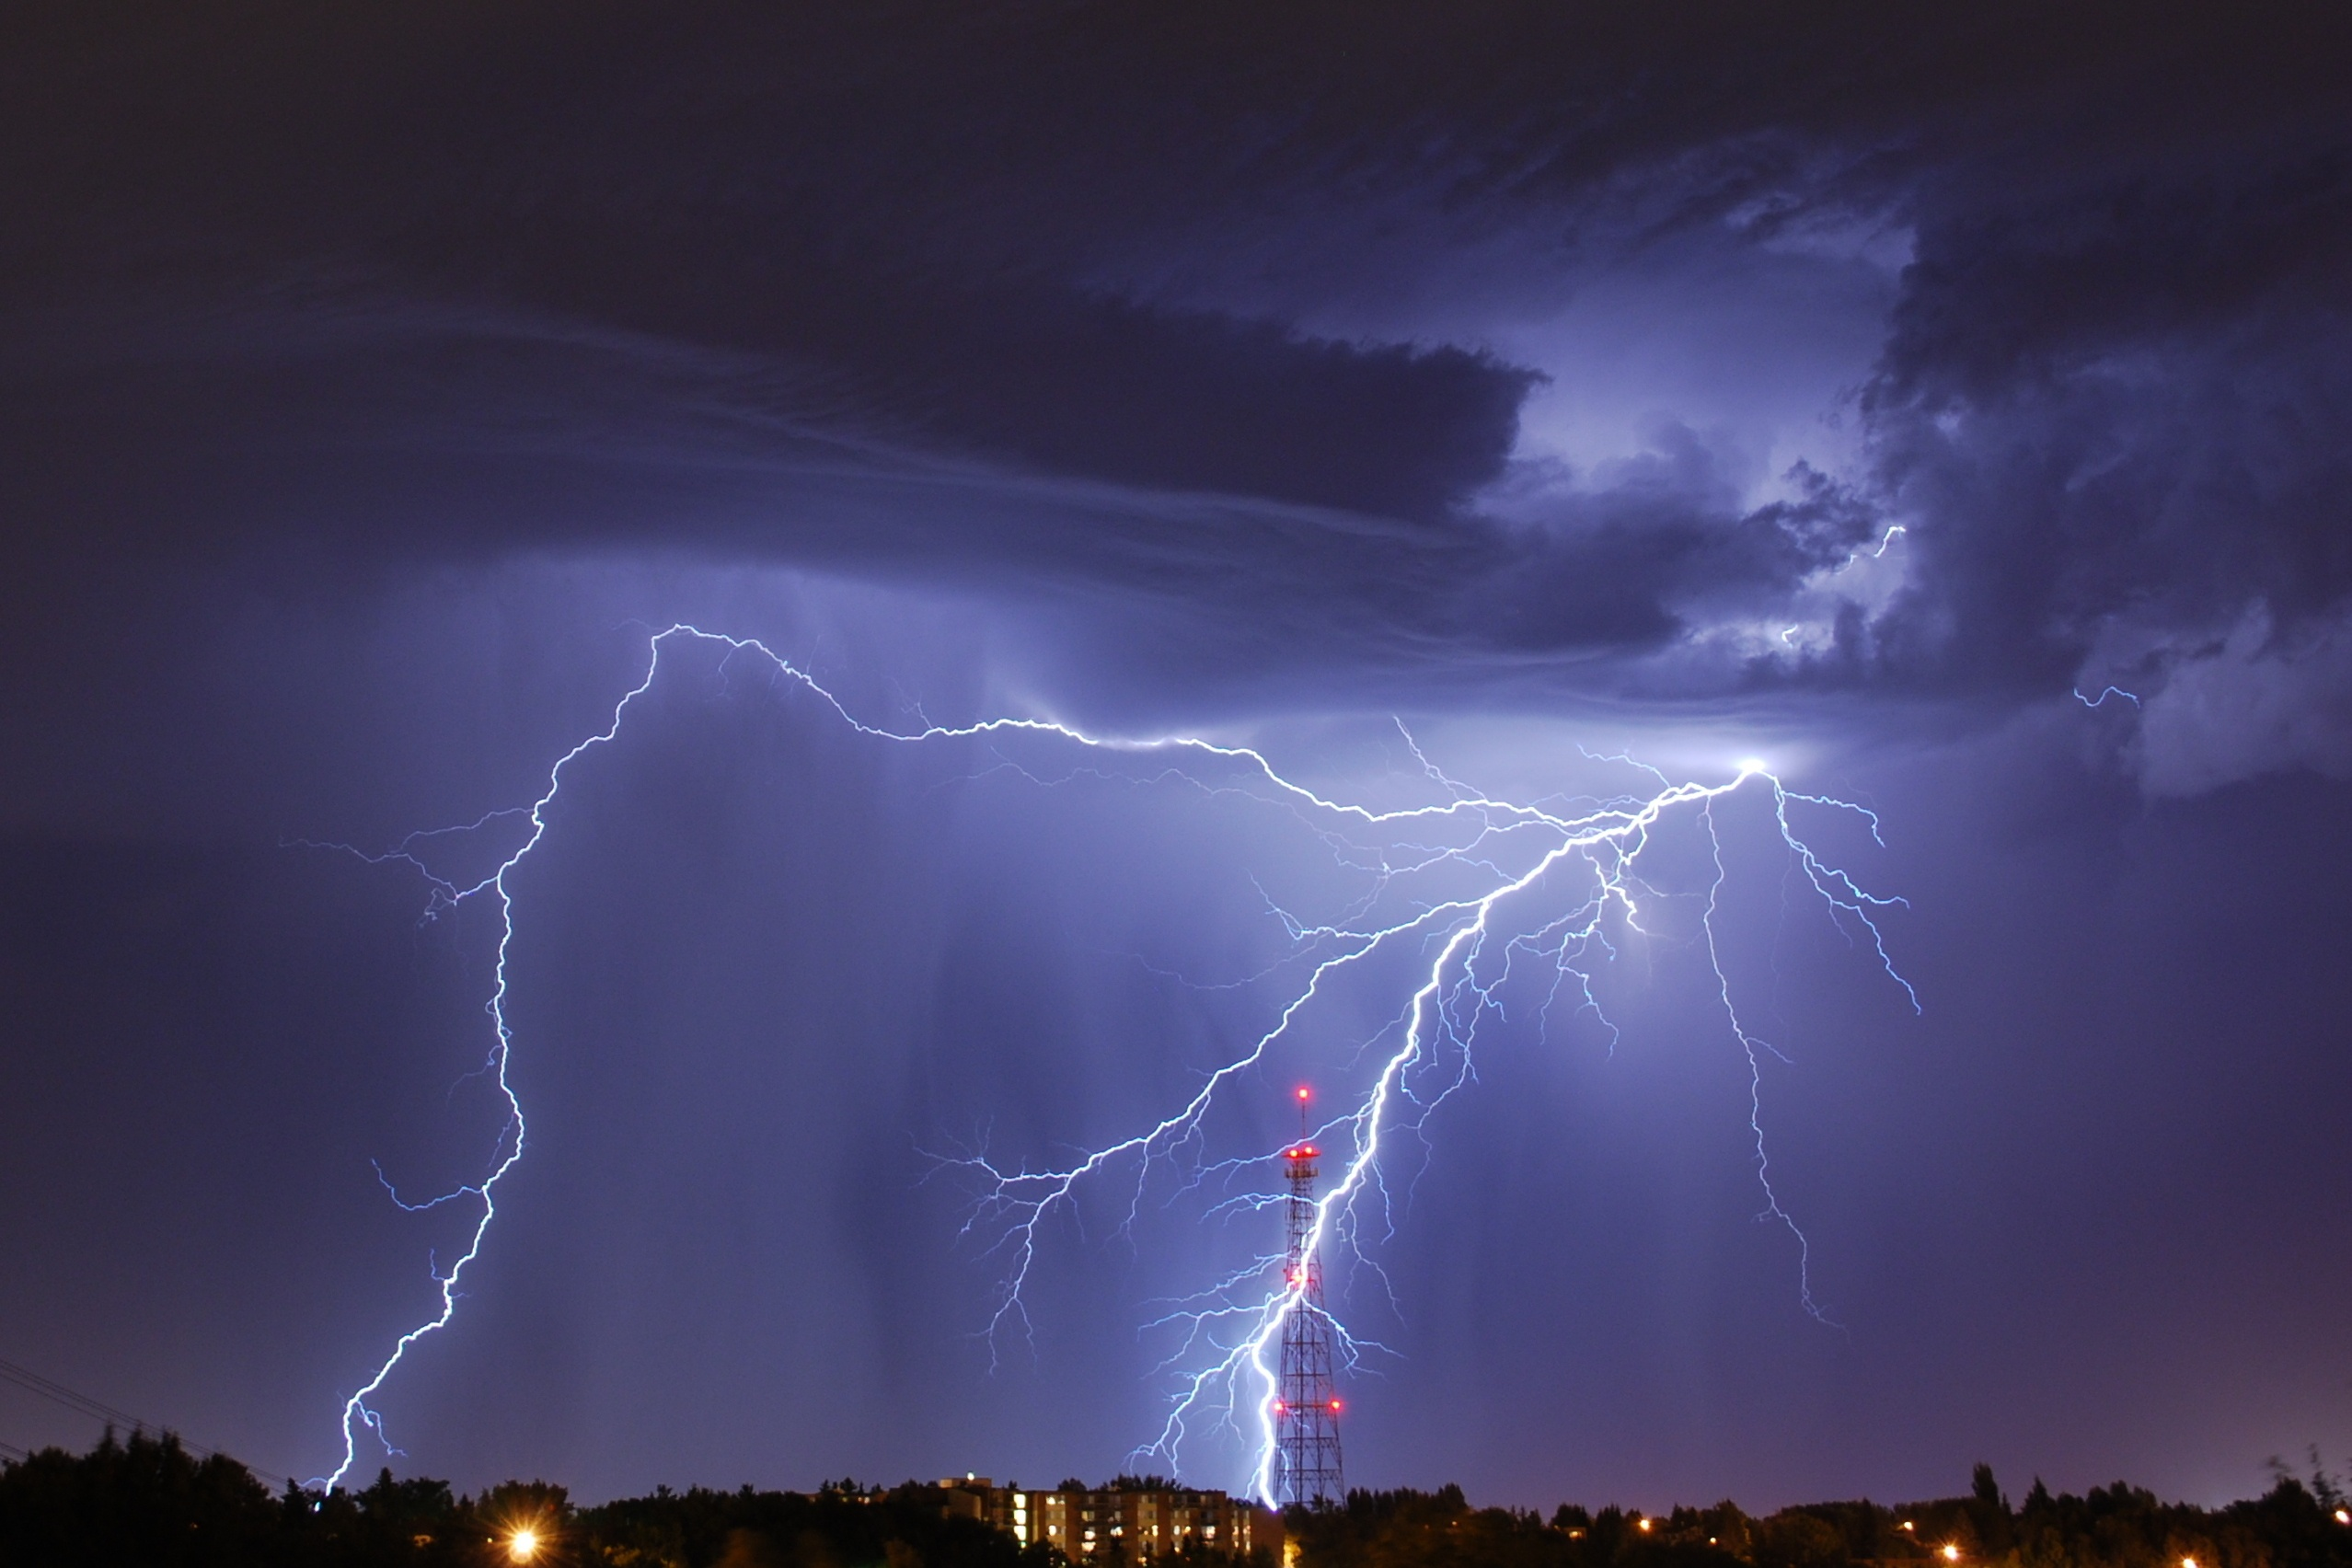 Lightning strike near radio tower